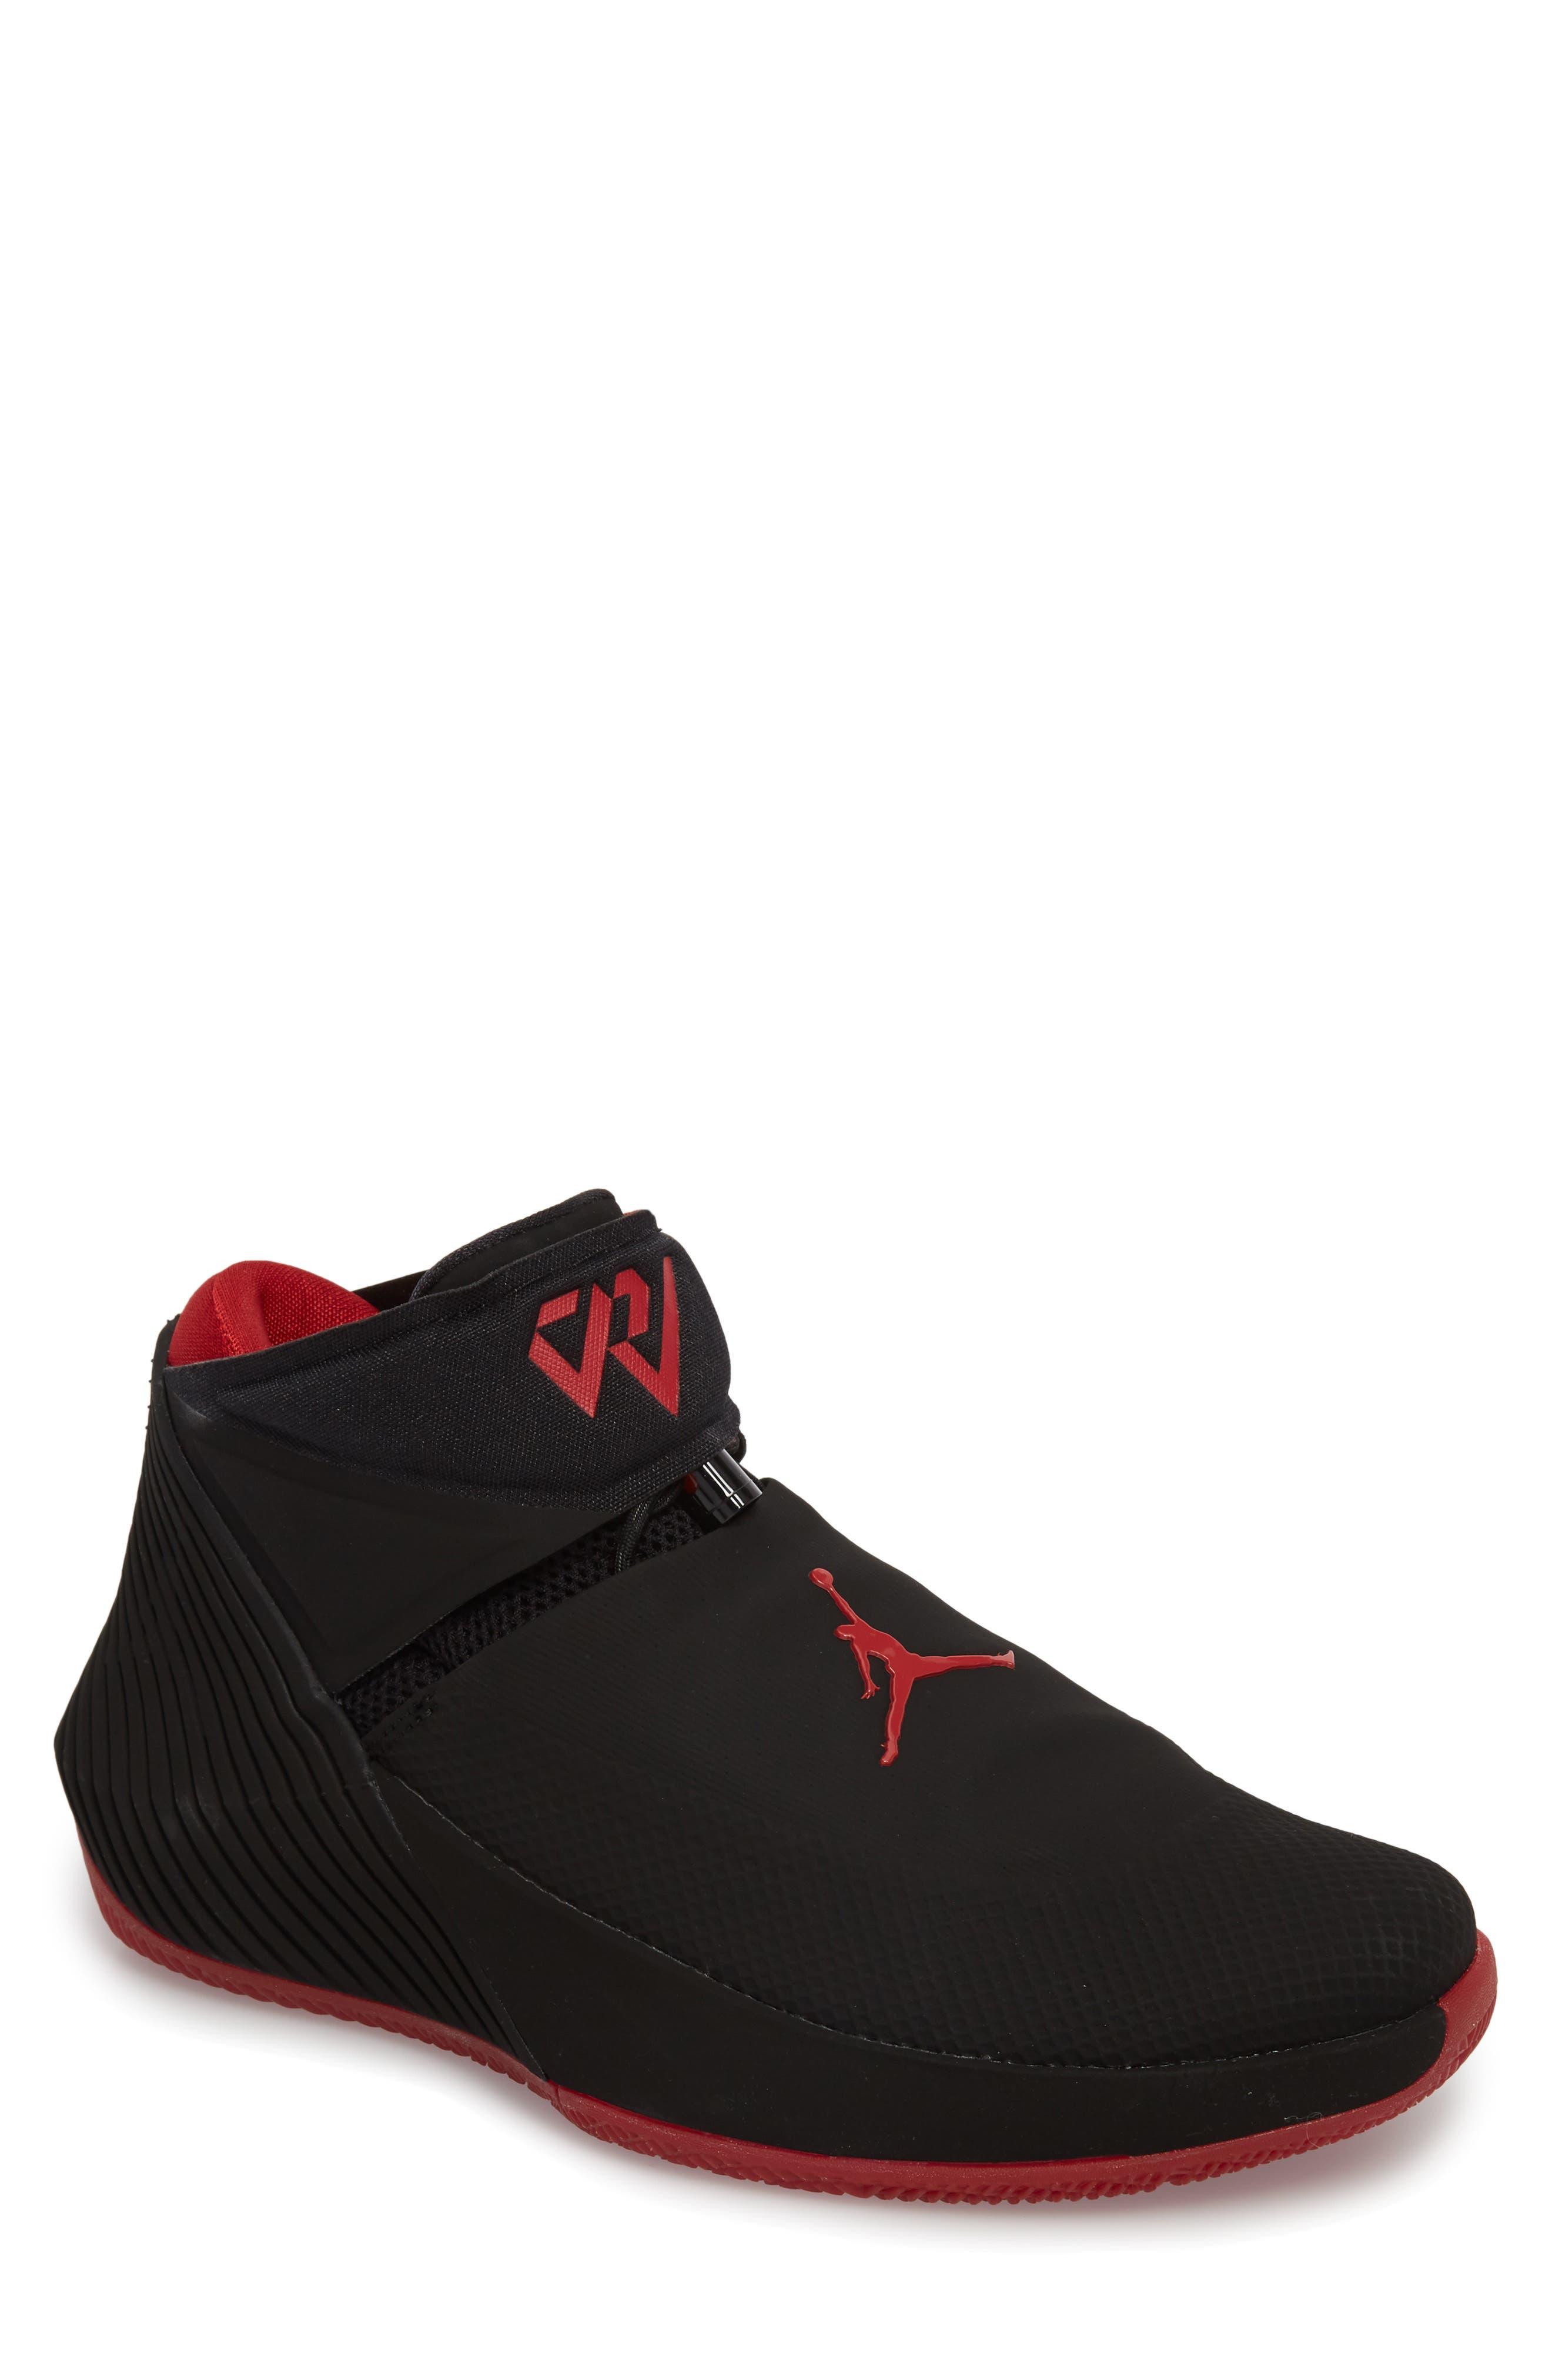 Jordan 'Why Not?' Zero.1 Basketball Shoe,                             Main thumbnail 1, color,                             Black/ Hyper Royal